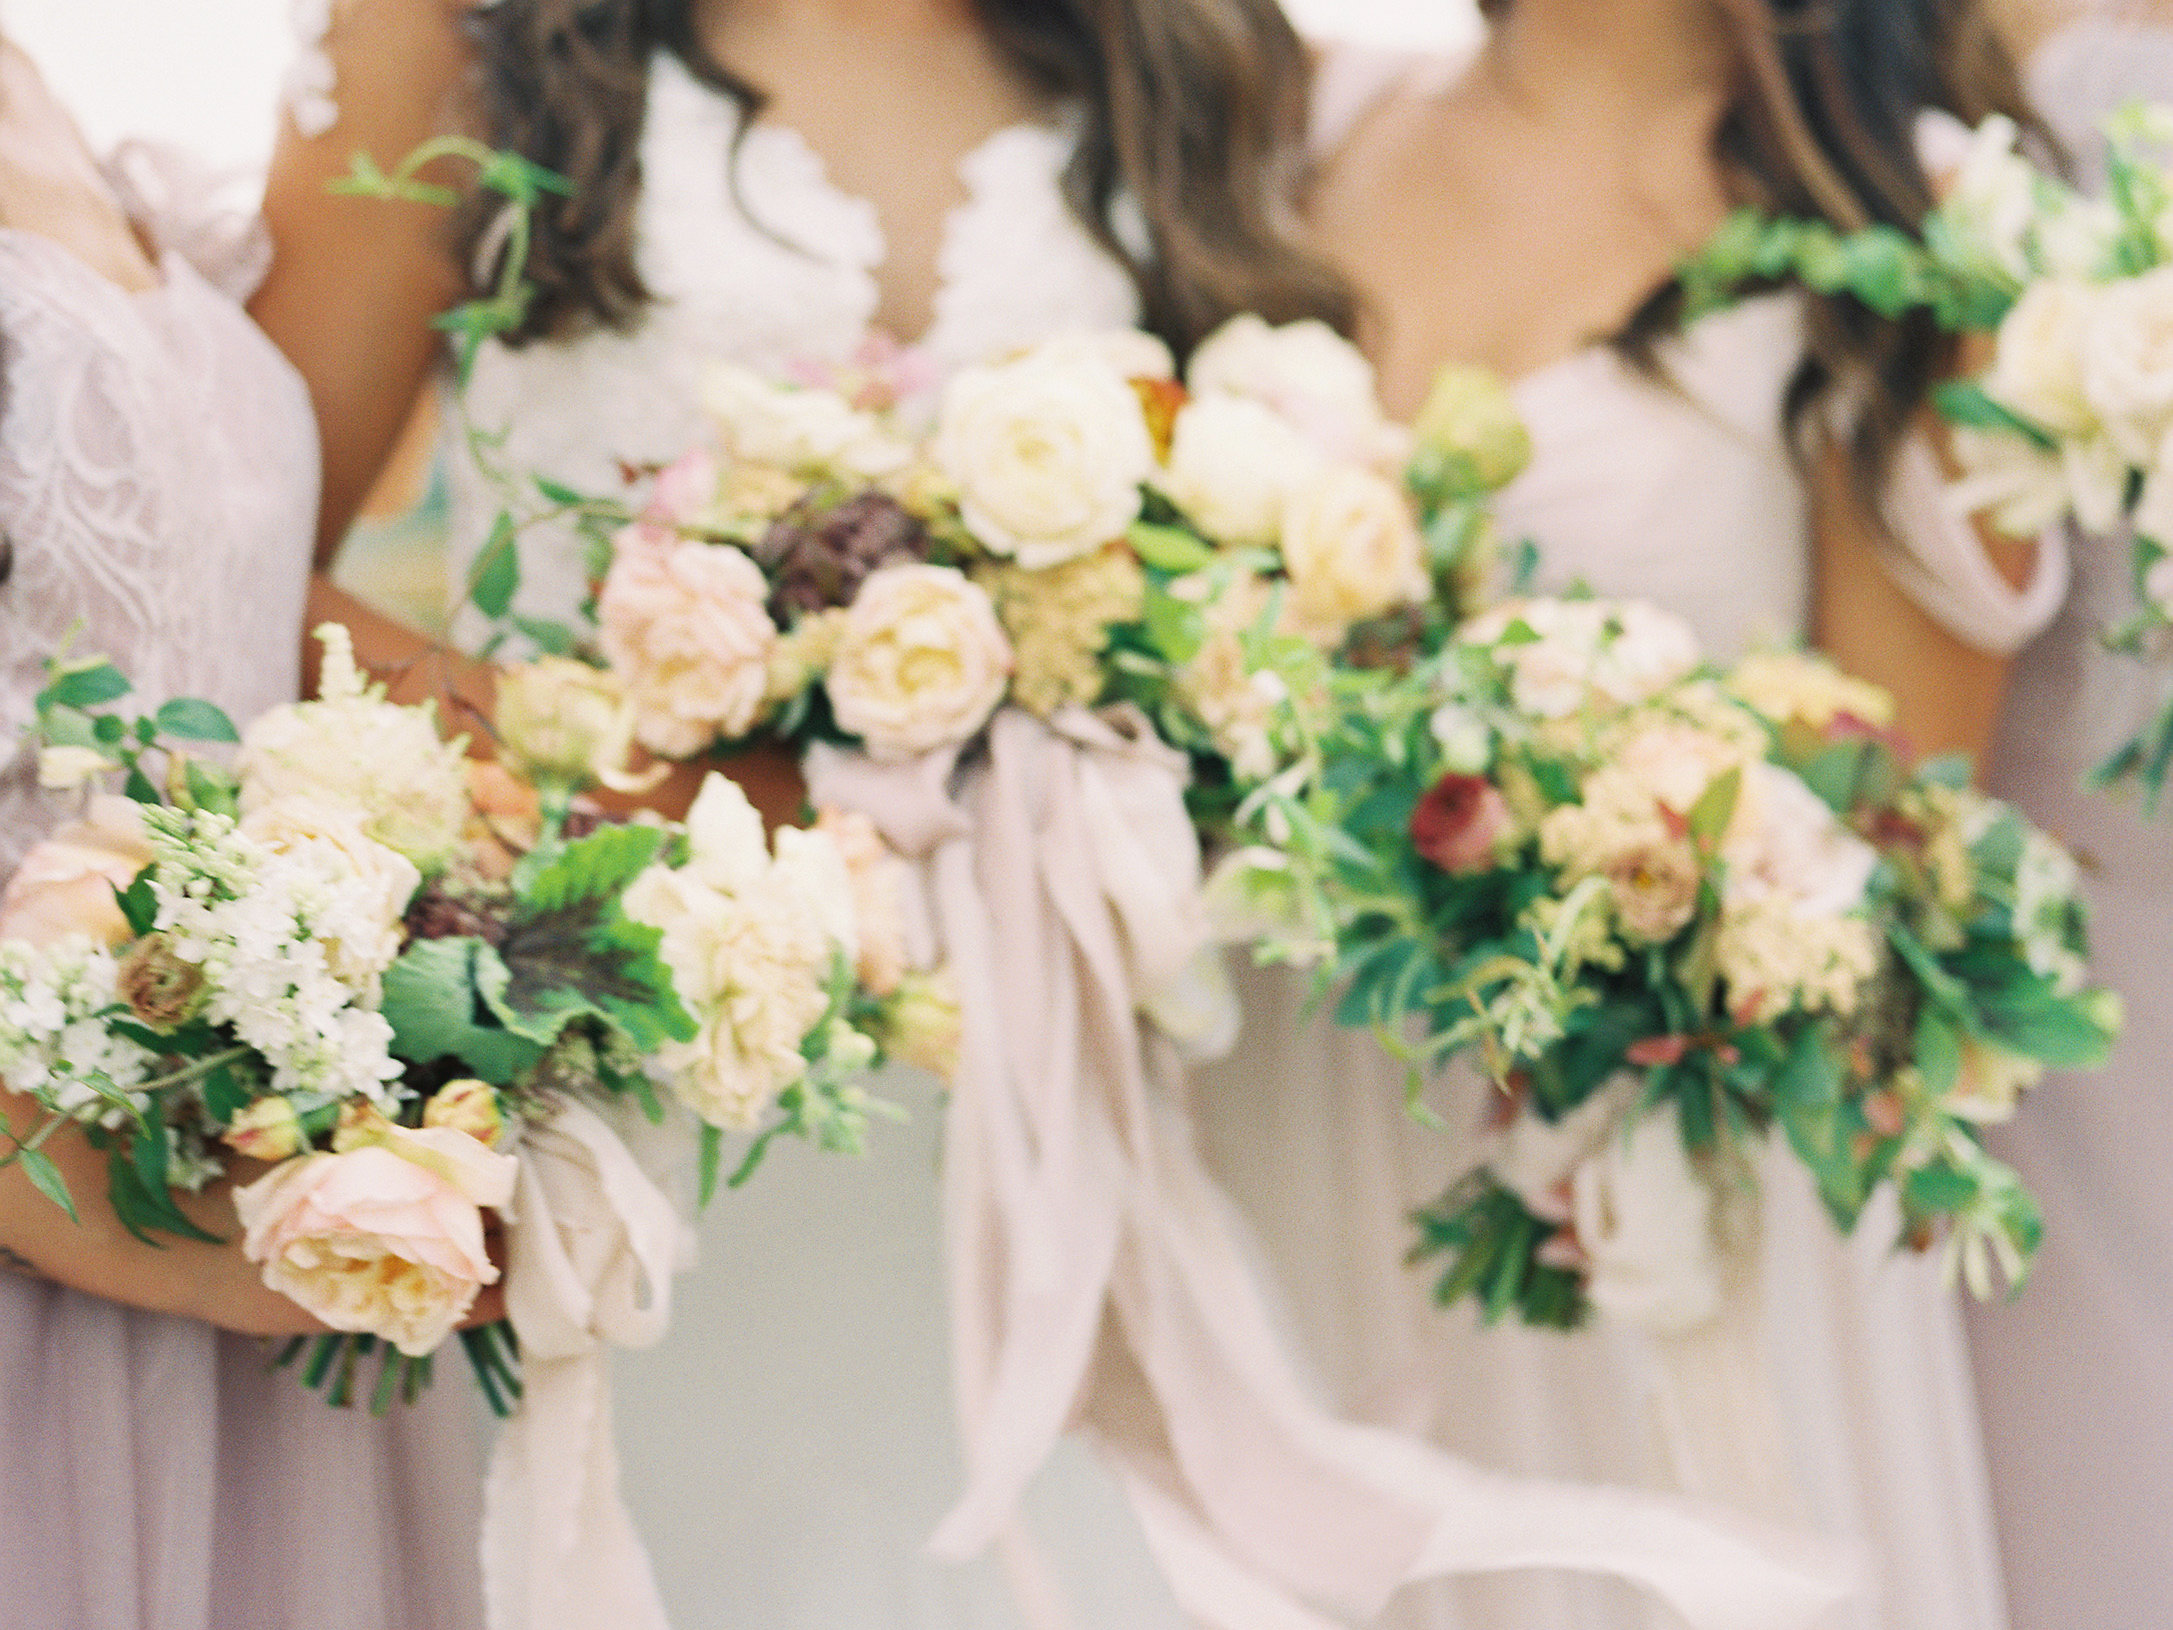 jessica-zimmerman-events-arkansas-wedding-summer-bouquets.jpg